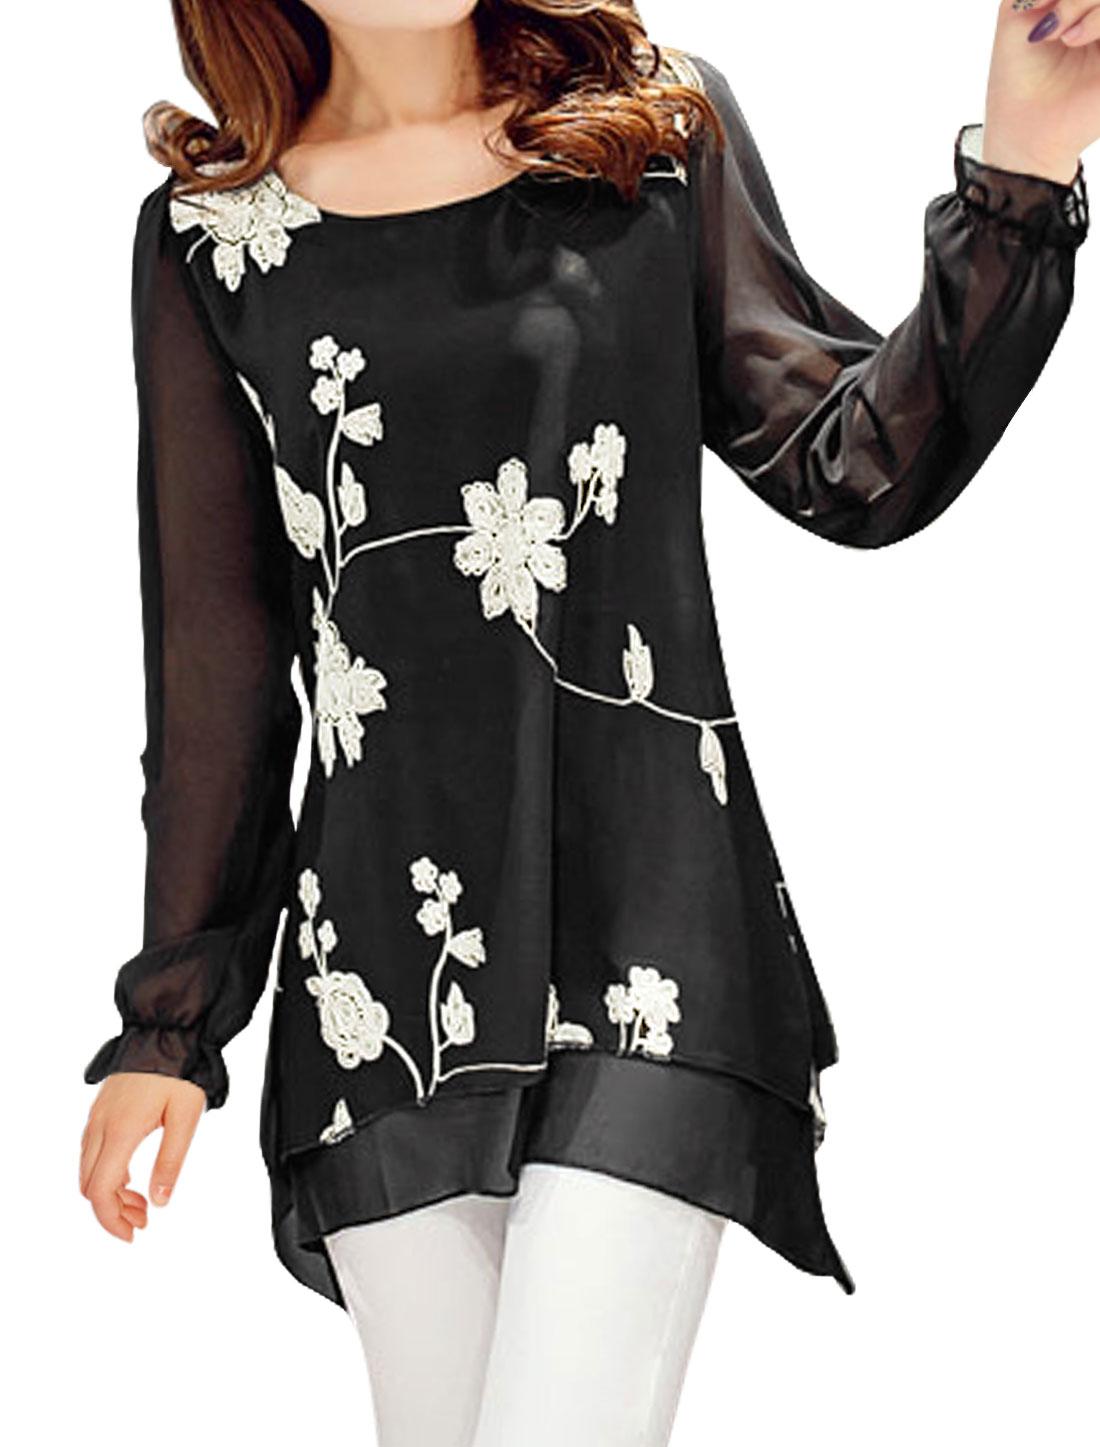 Women Flower Stitched Asymmetric Layered Tunic Blouse Black L